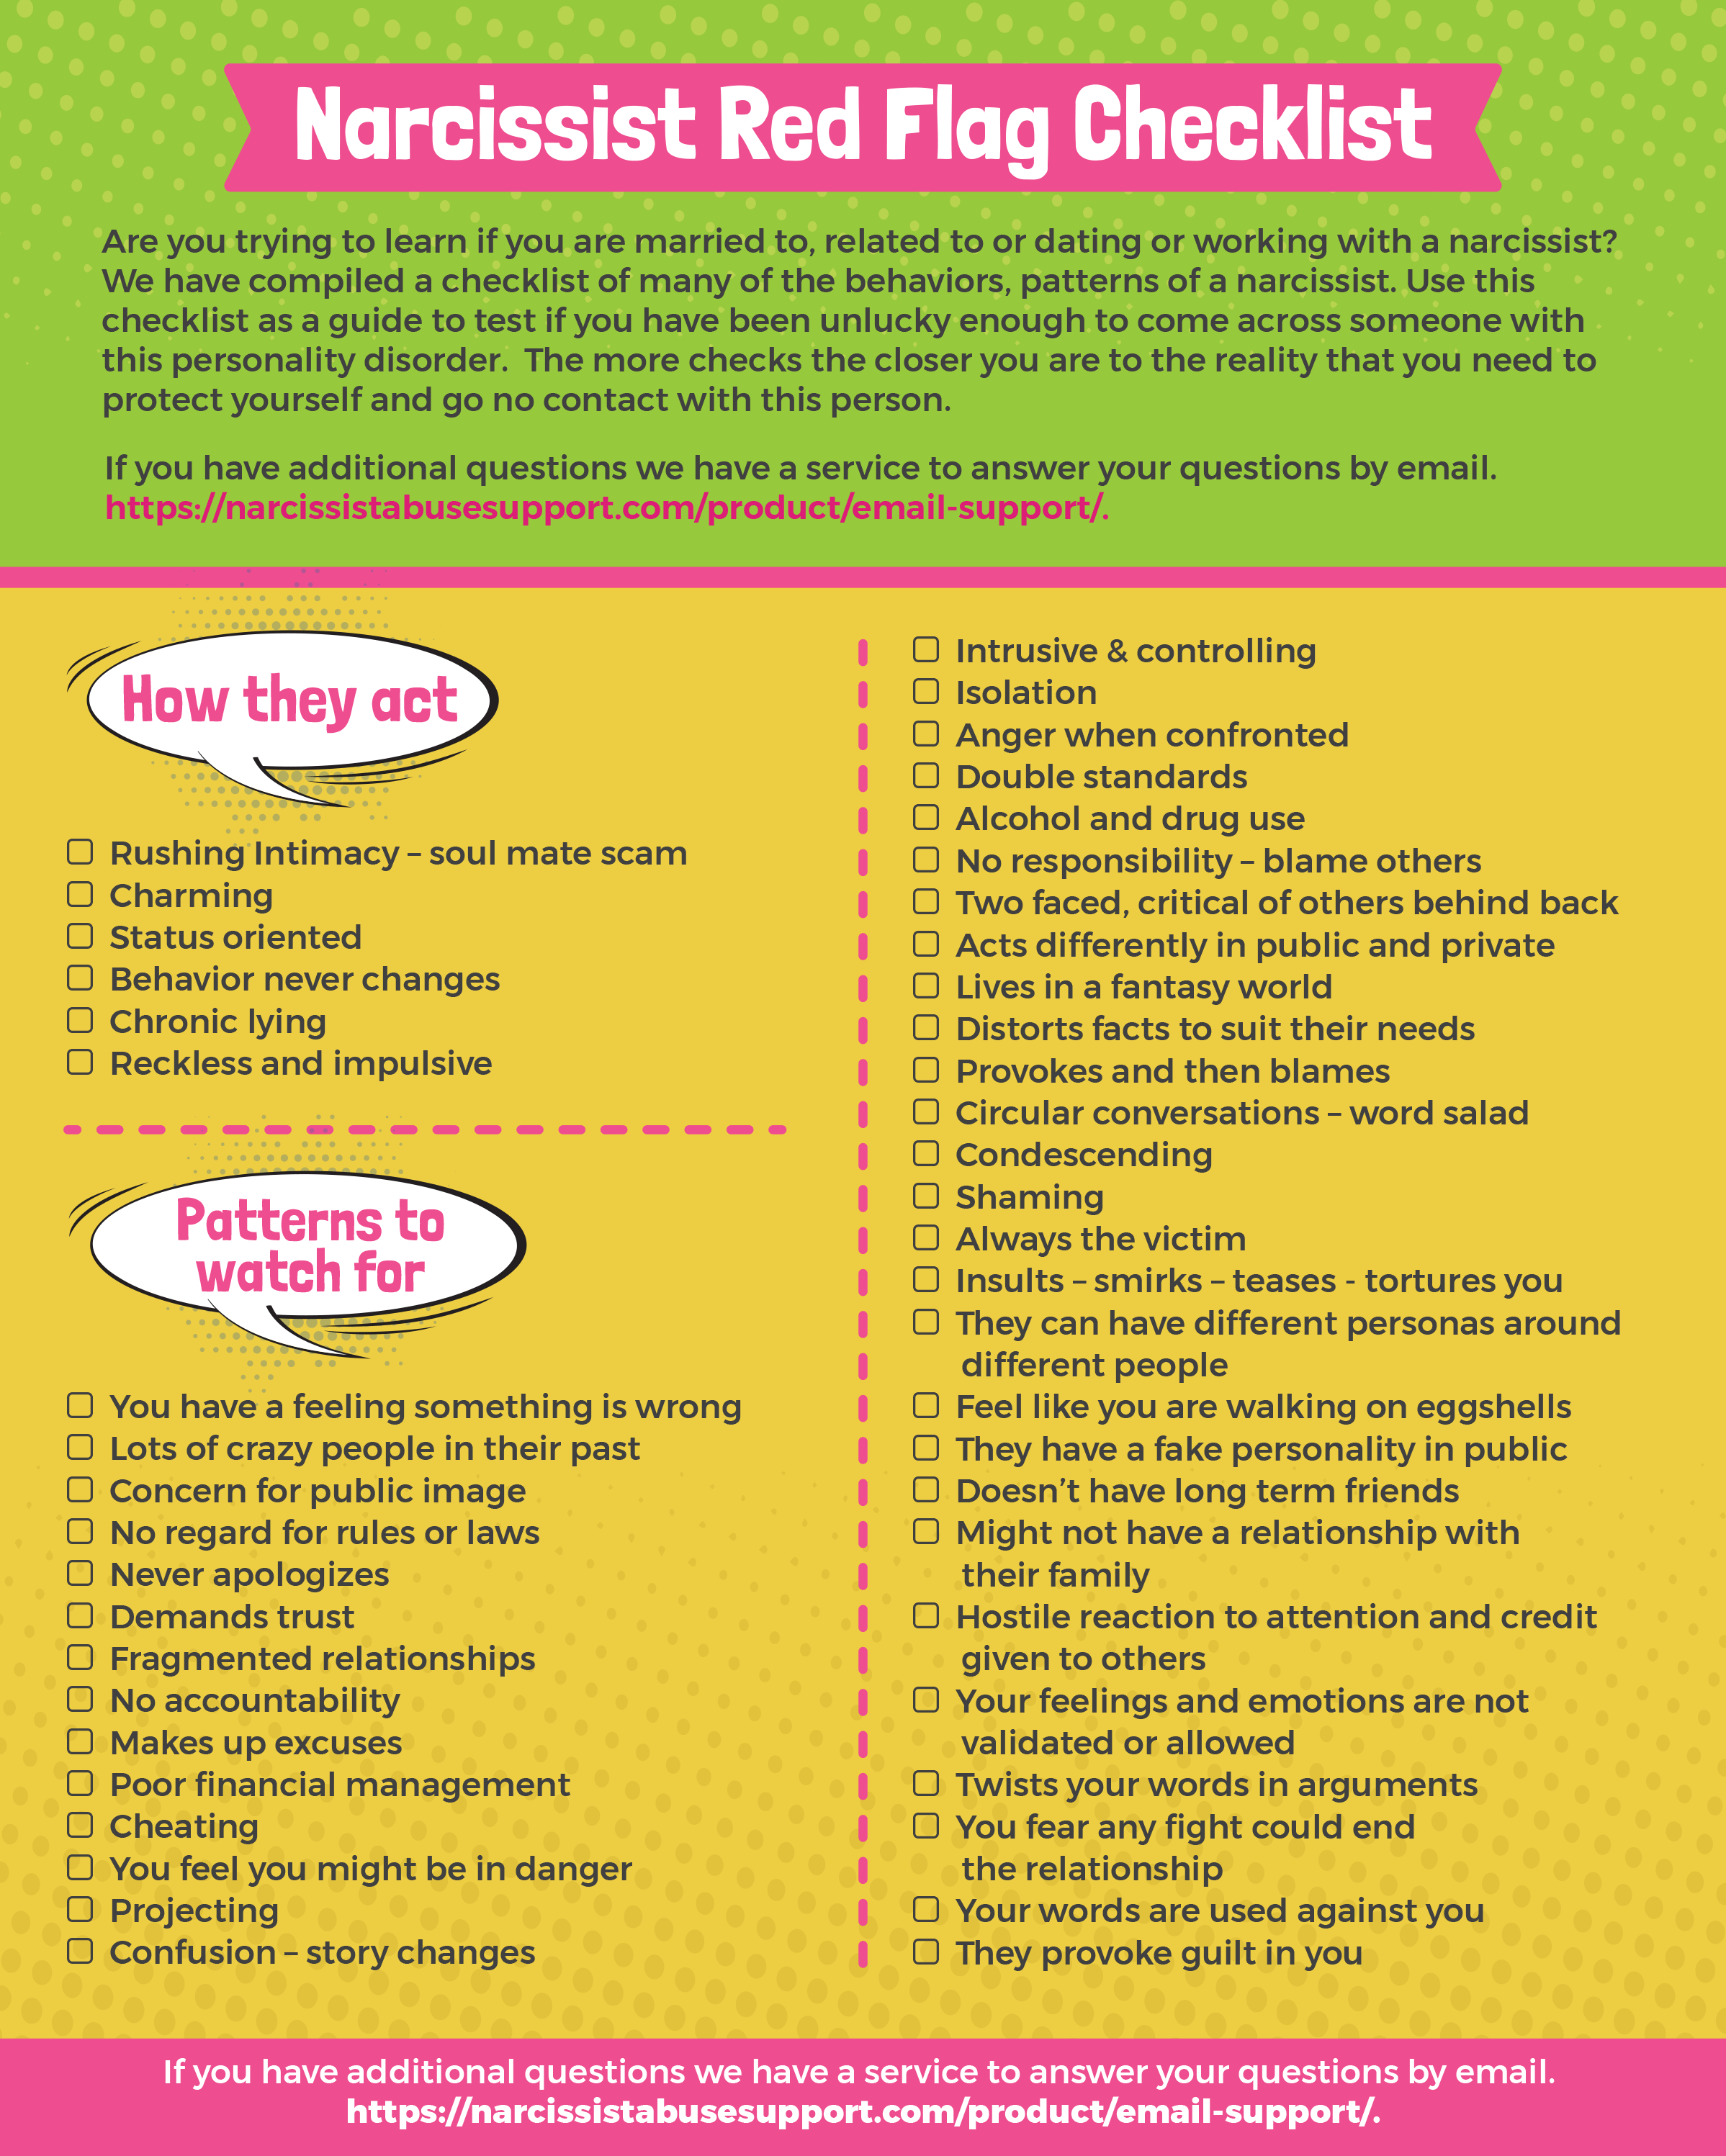 Narcissist Red Flag Checklist